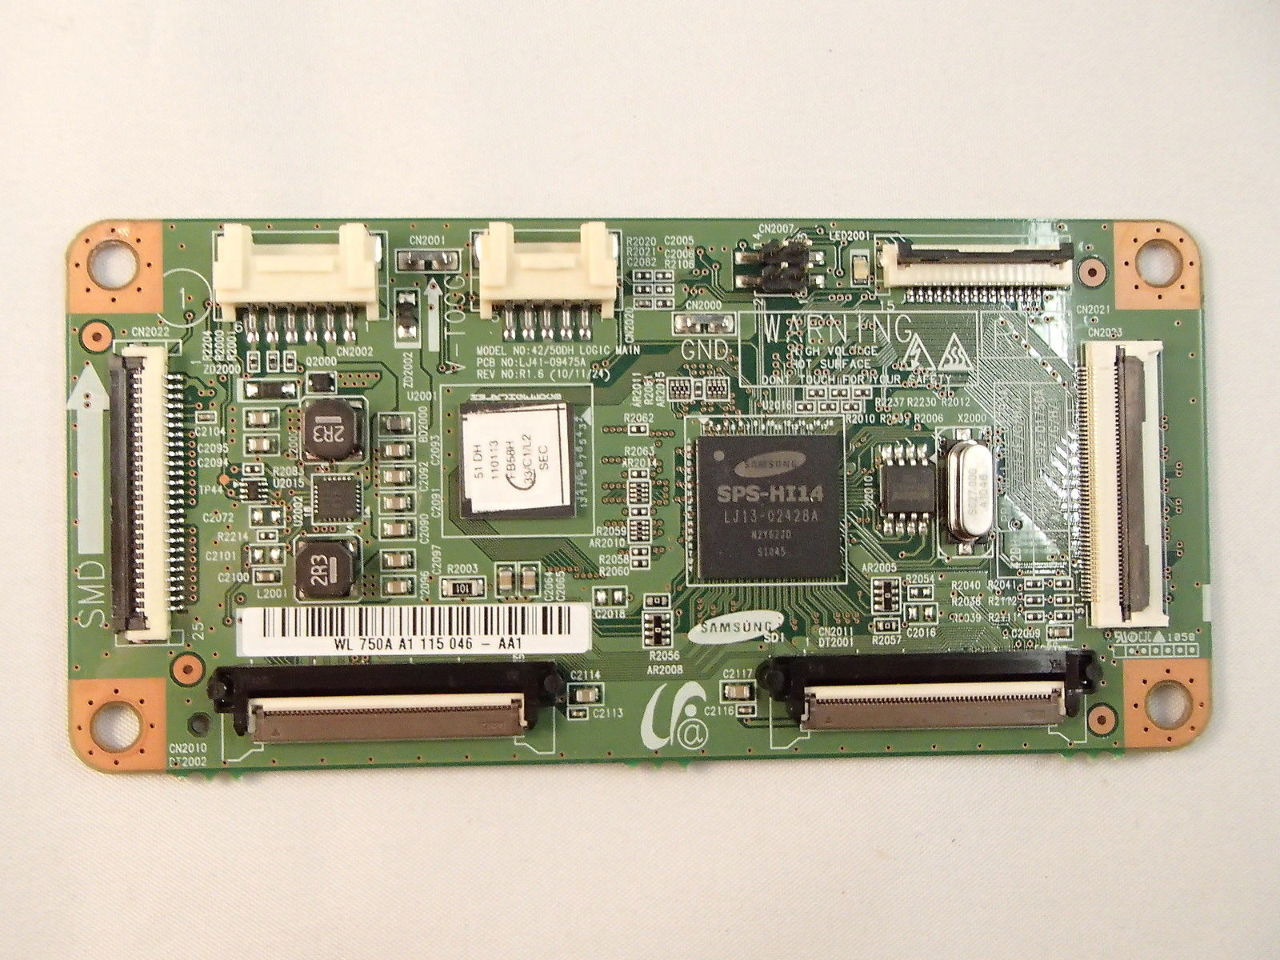 samsung 51 pn51d430 pn51d440 lj92 01750a t con main logic control rh ebay com Samsung User Manual Guide Samsung Refrigerator Repair Manual